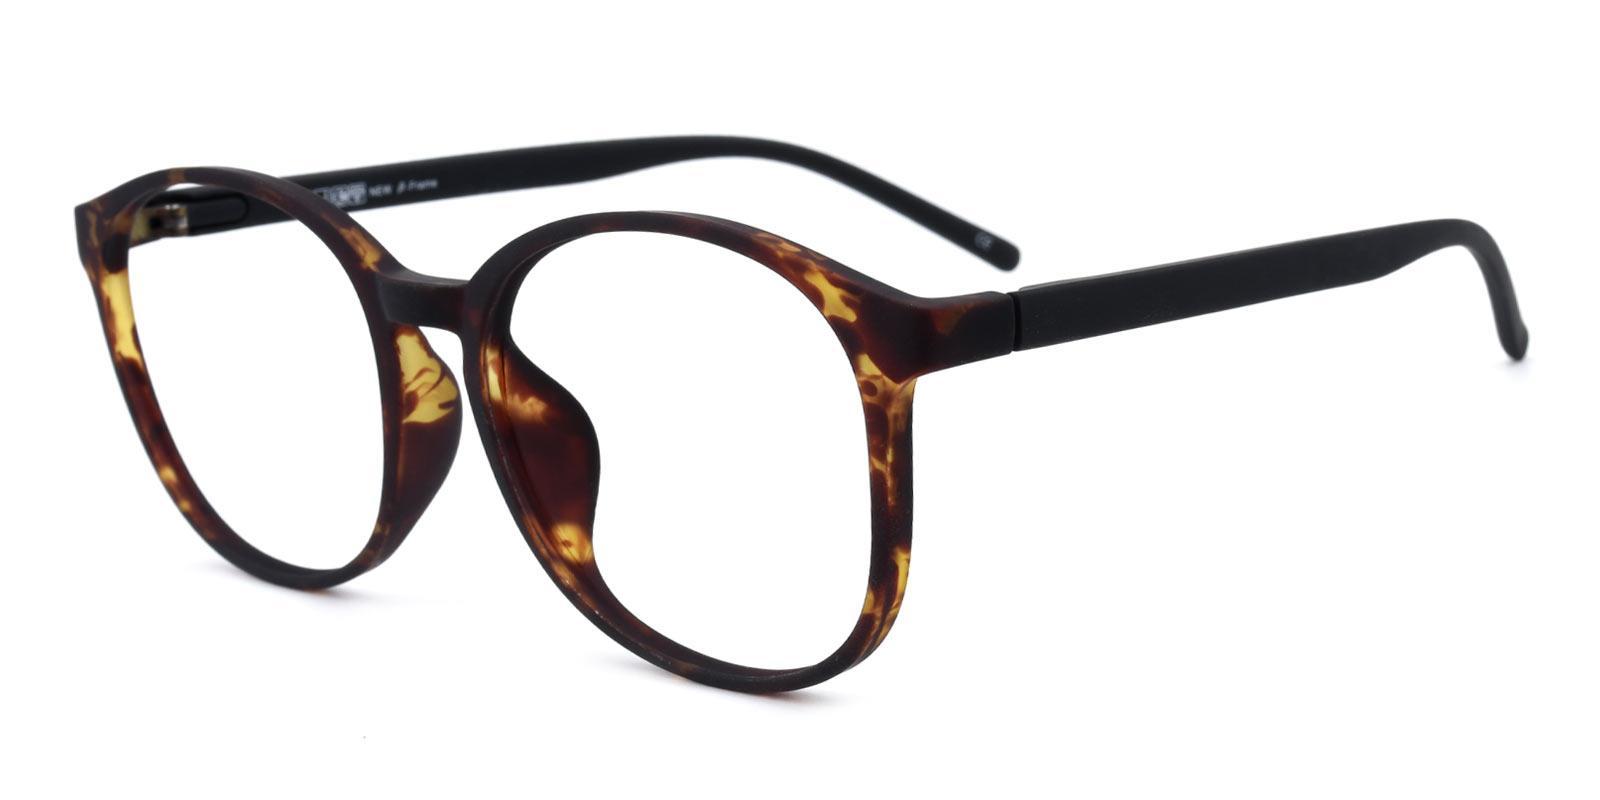 Kolins-Tortoise-Square-TR-Eyeglasses-additional1